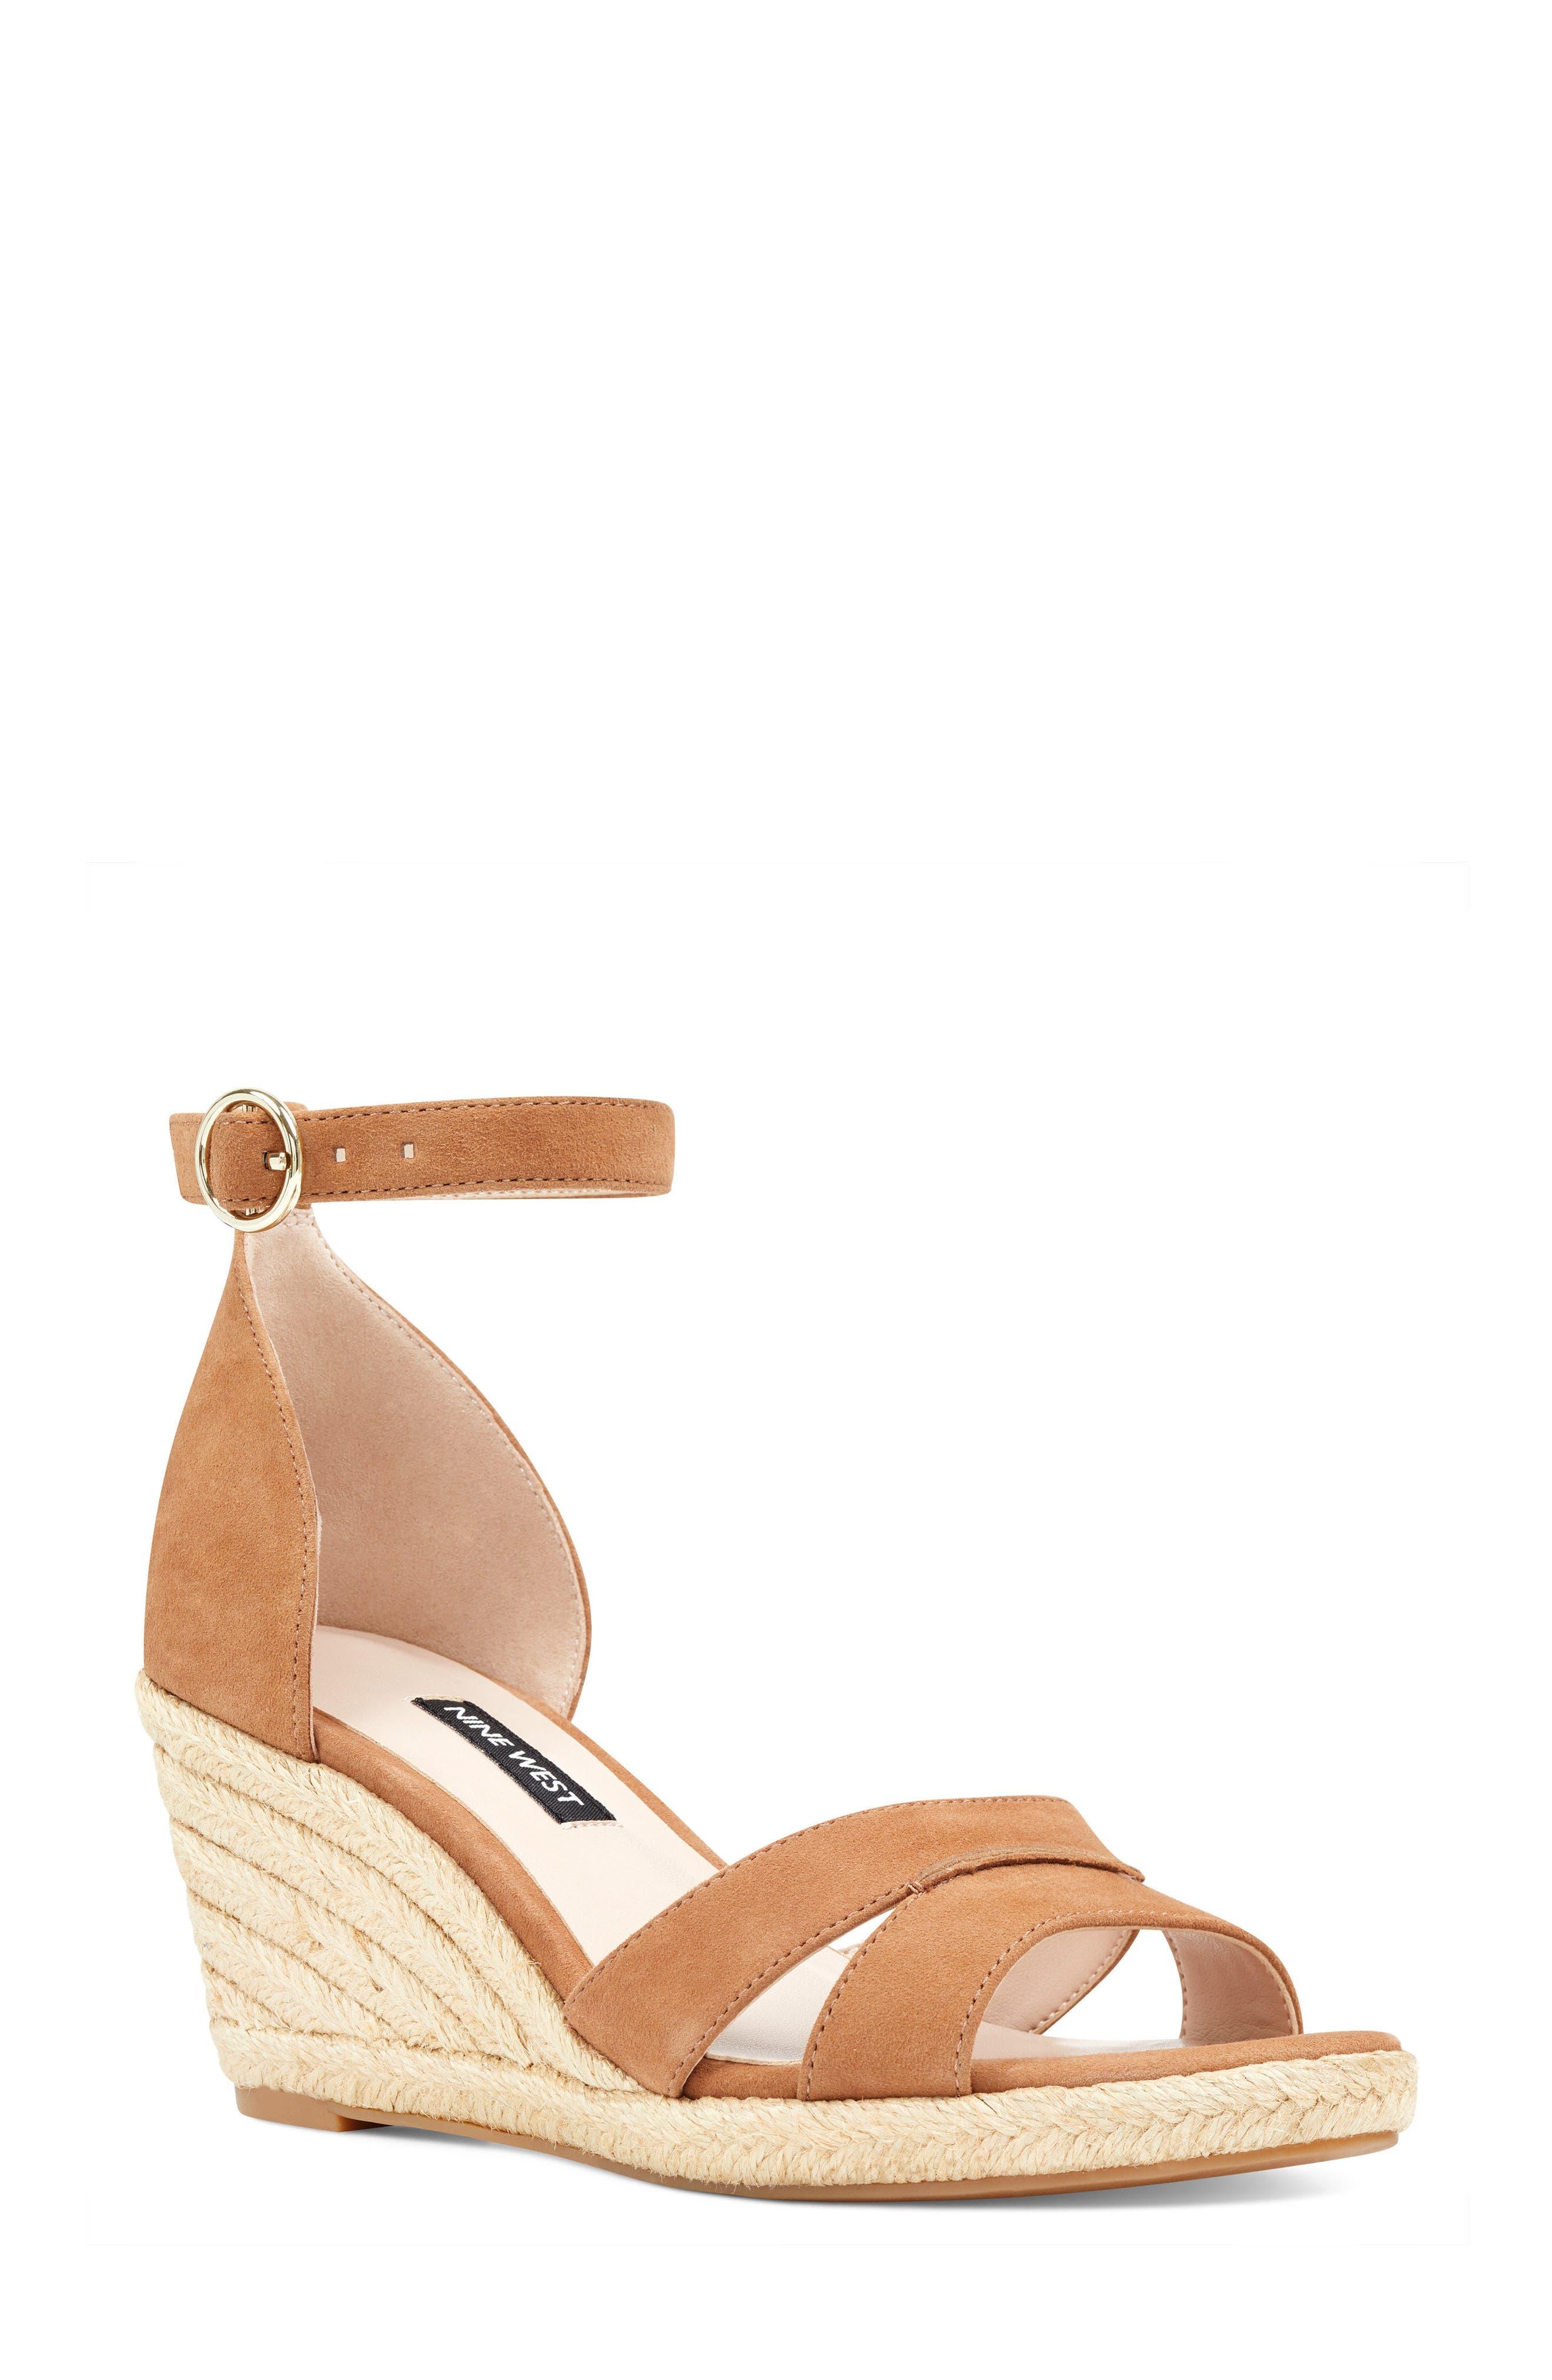 Jeranna Espadrille Wedge Sandal,                         Main,                         color, Dark Natural Suede